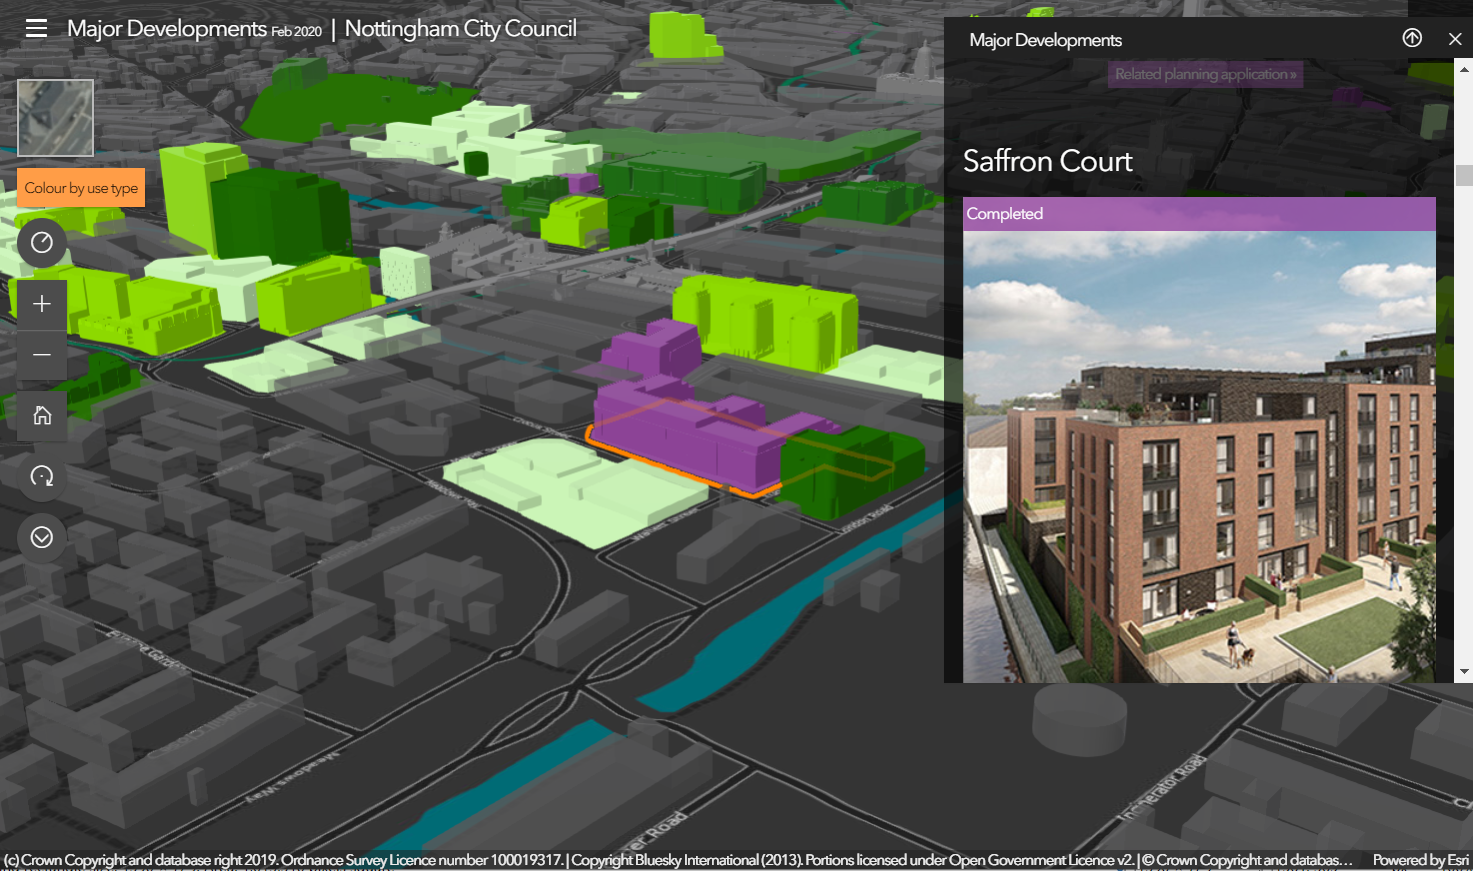 Nottingham City Council development plan presentation using ArcGIS